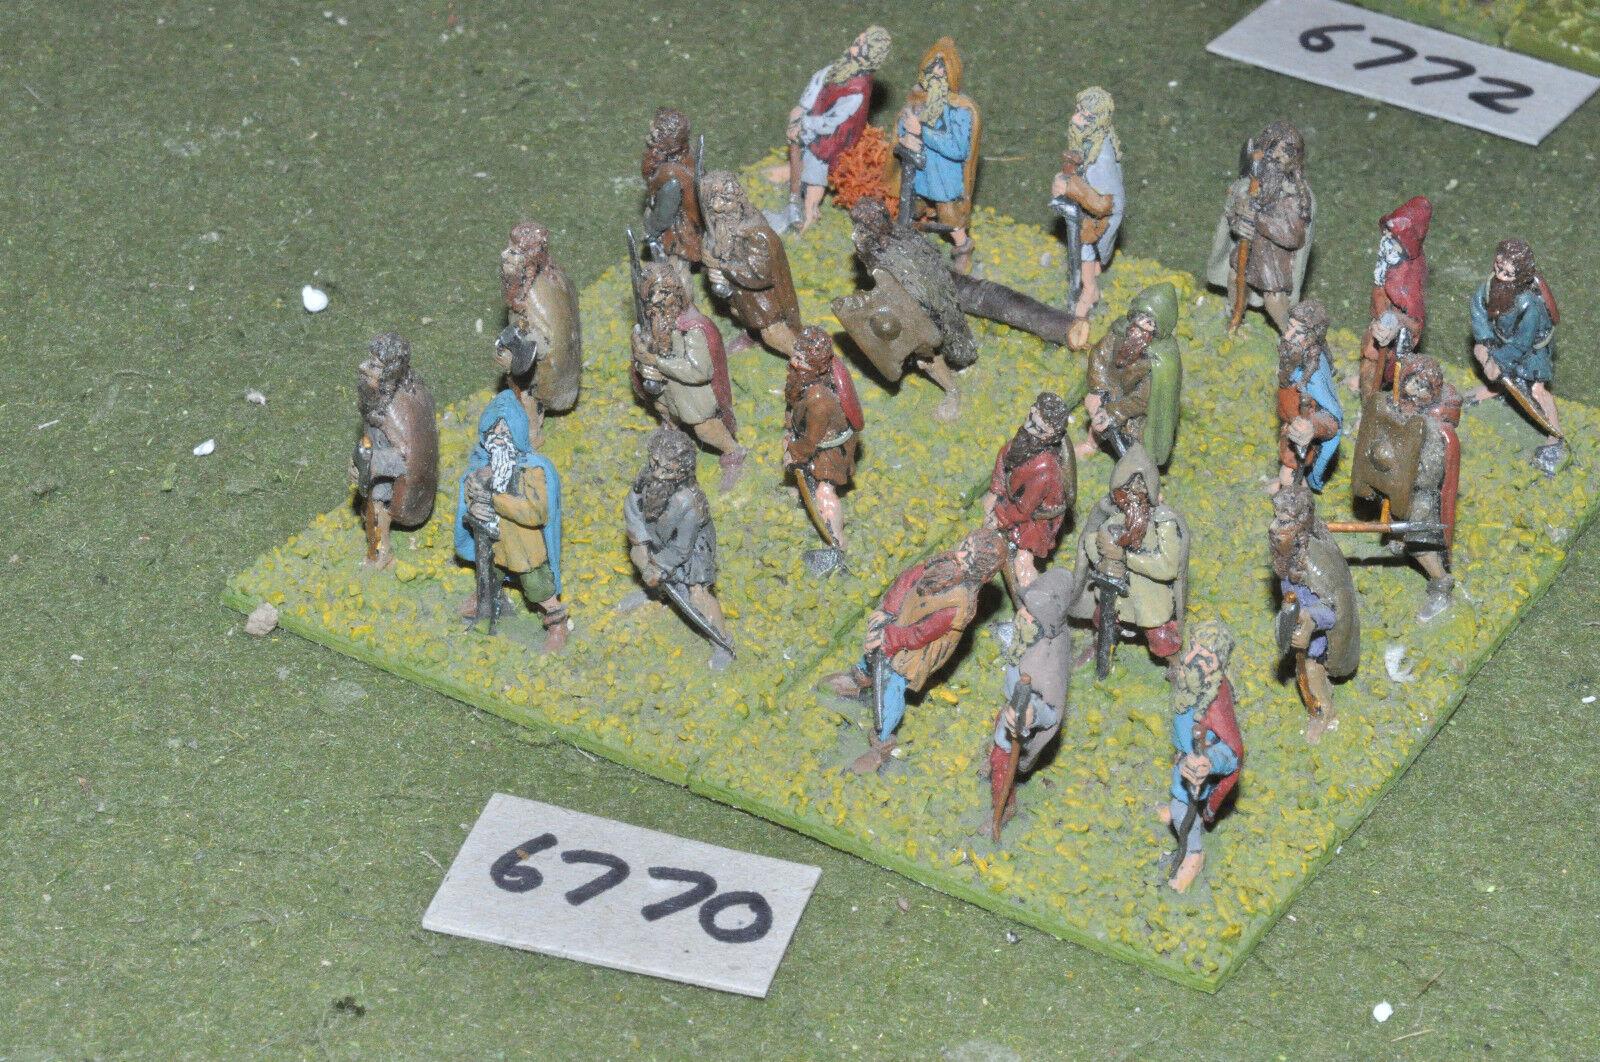 25mm mittelalterlichen   anbieten (24) - anbieten (krieger metall gemalt - inf (6770)